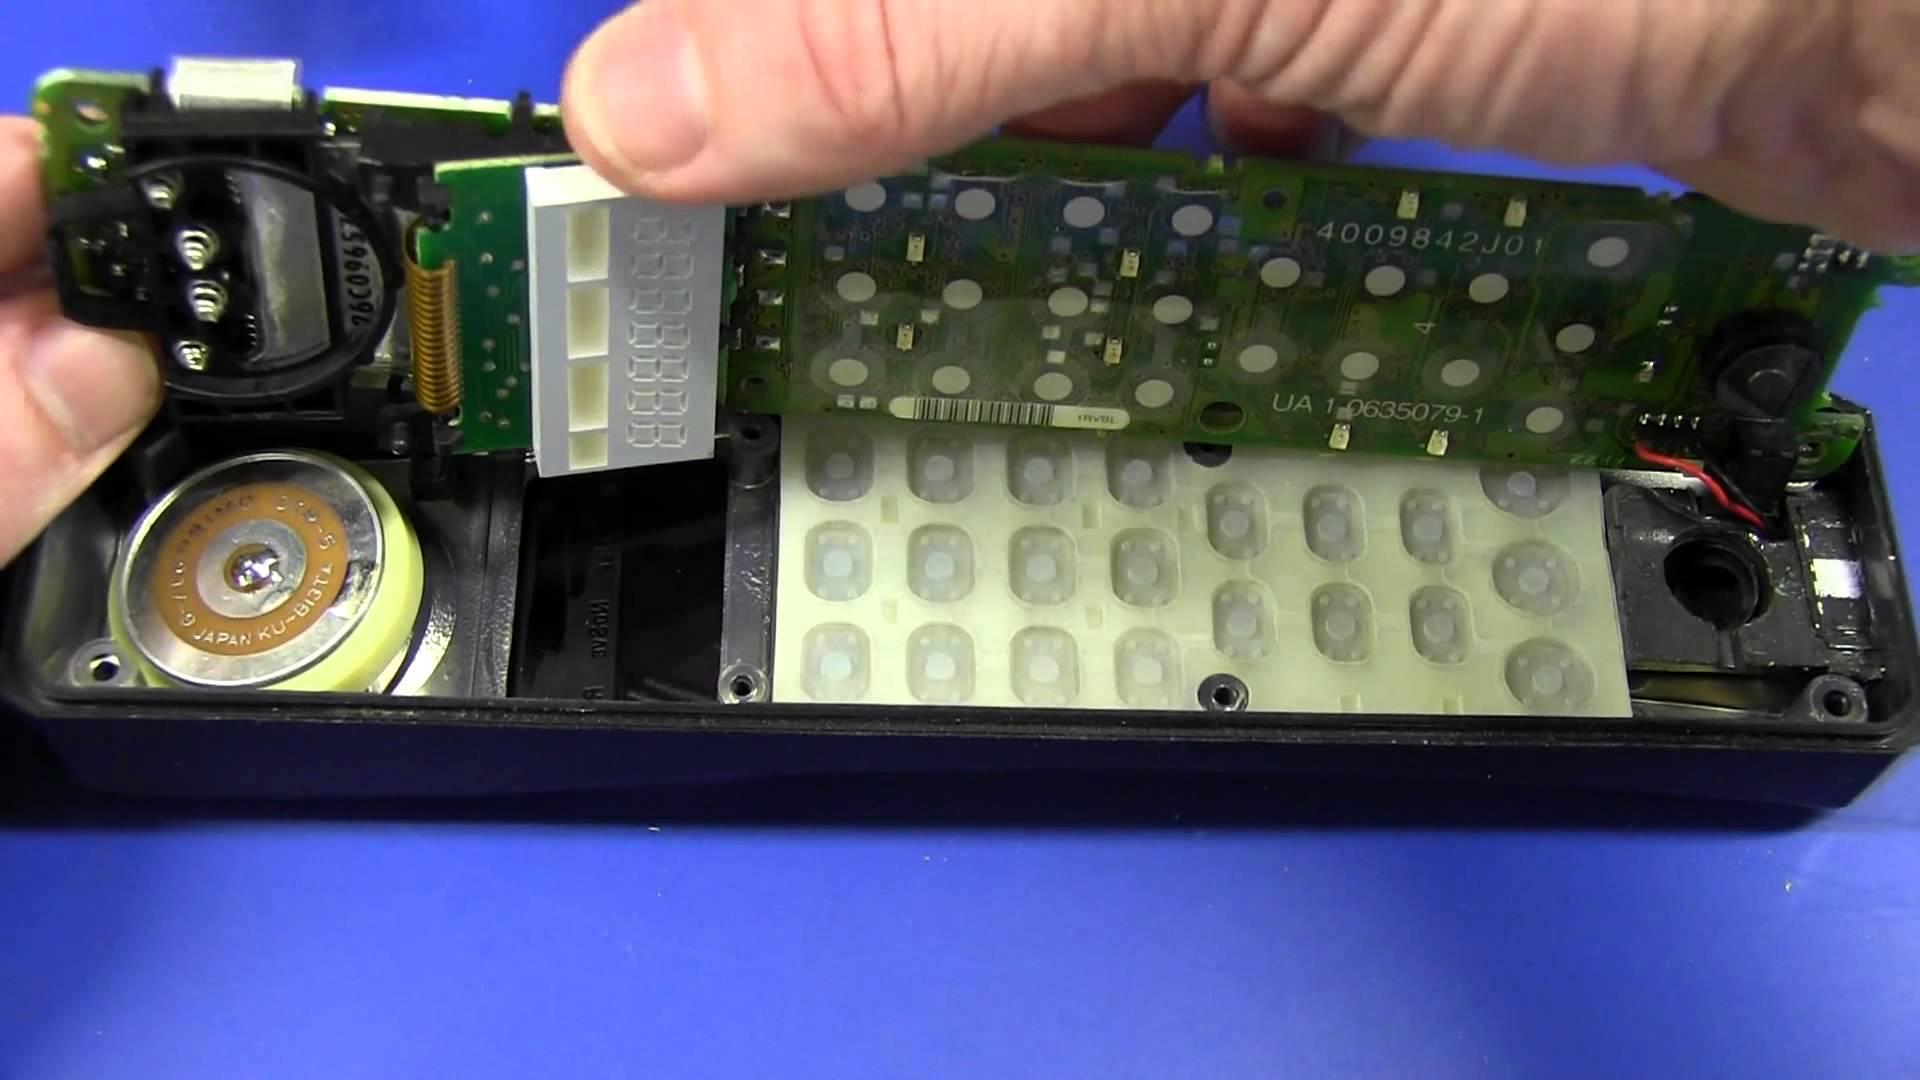 EEVblog #243 – Vintage Brick Mobile Phone Teardown